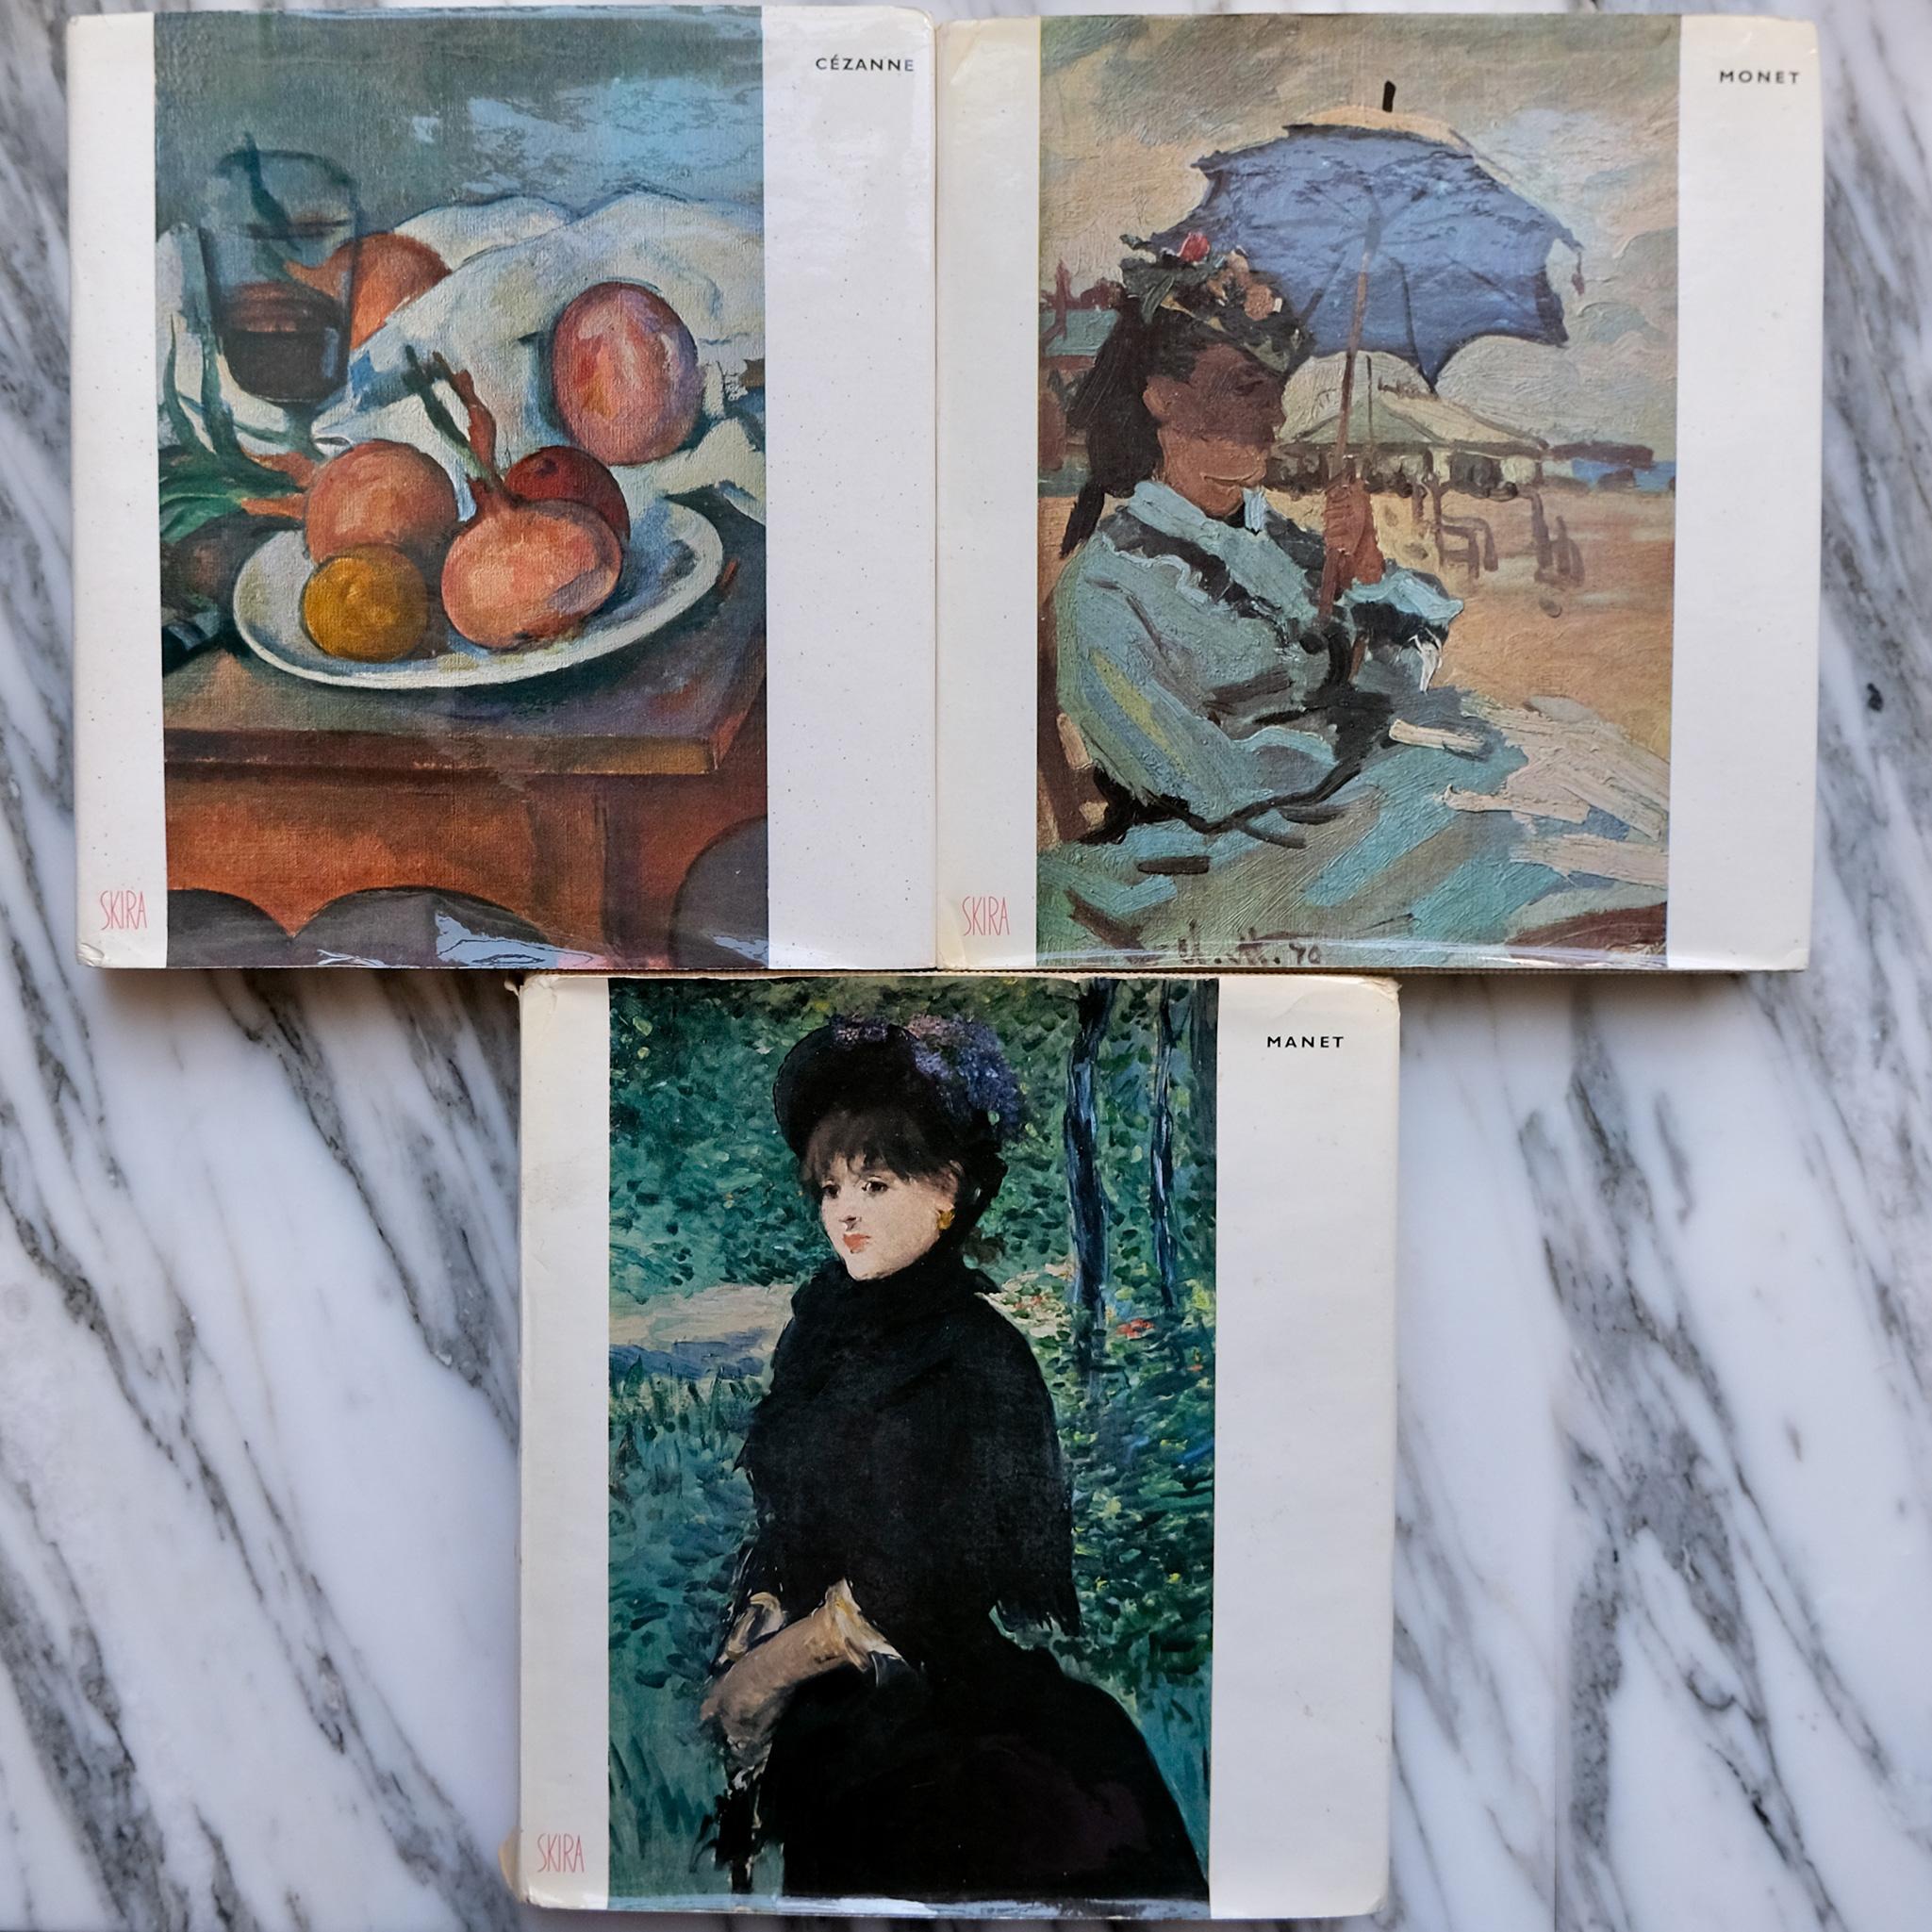 second bouquinistes auction Set of Cézanne, Manet, and Monet Books